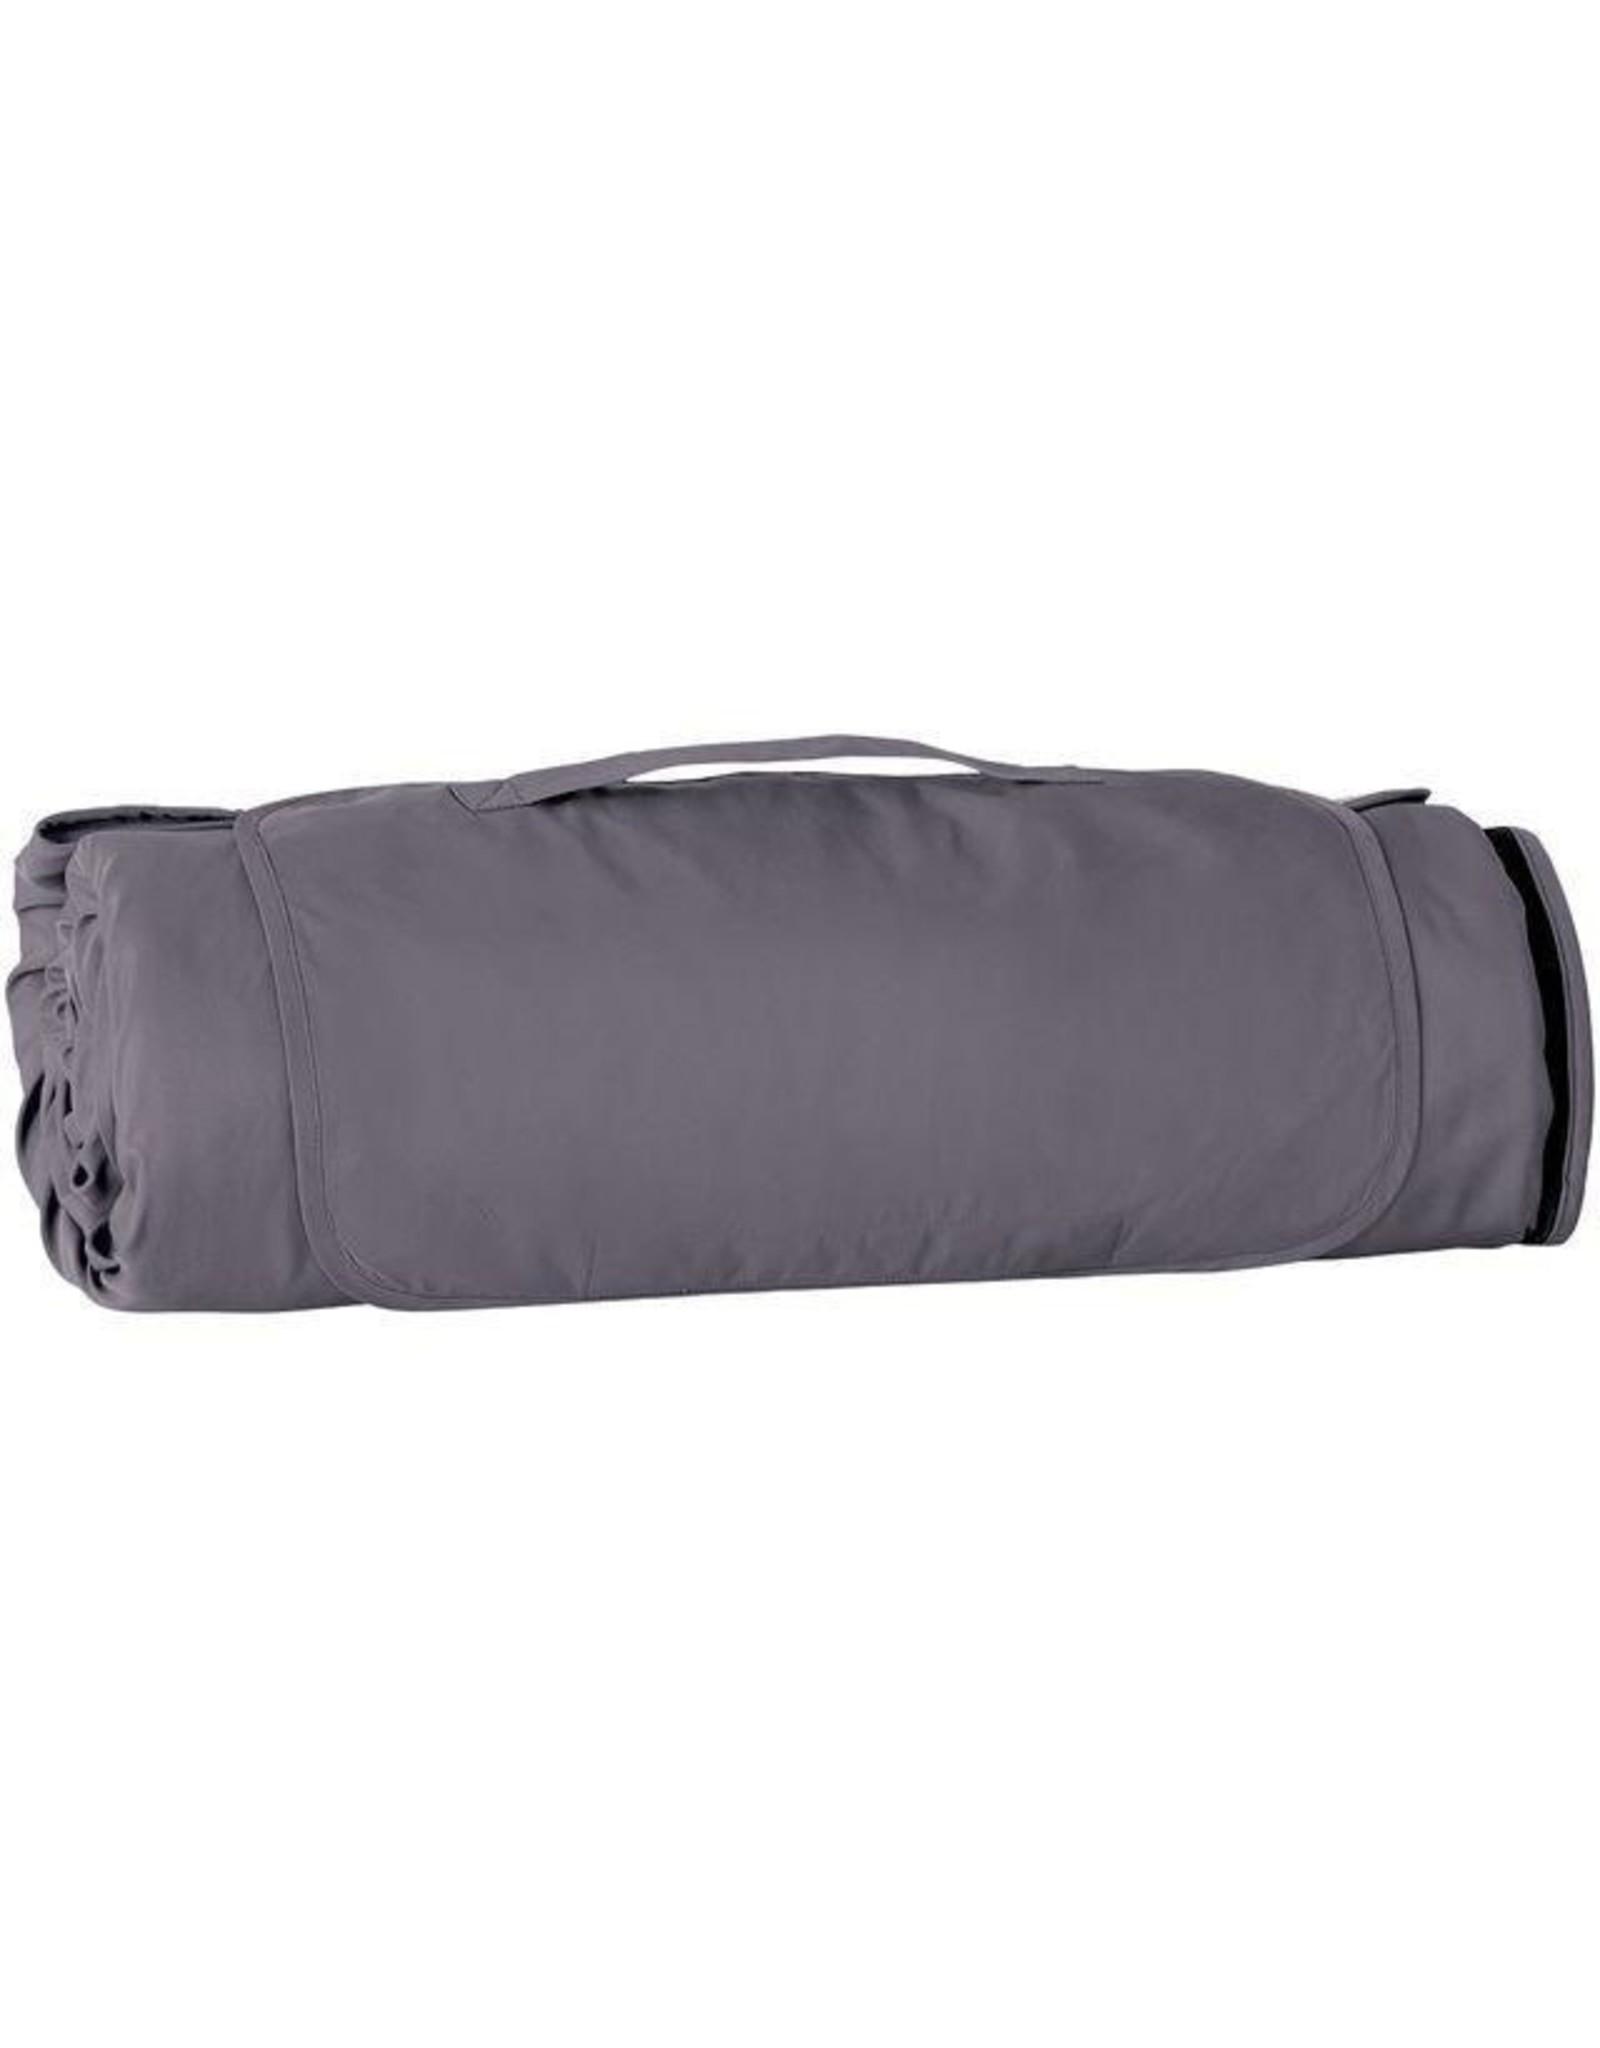 NON-UNIFORM JD Reversible & Weather Resistant Blanket